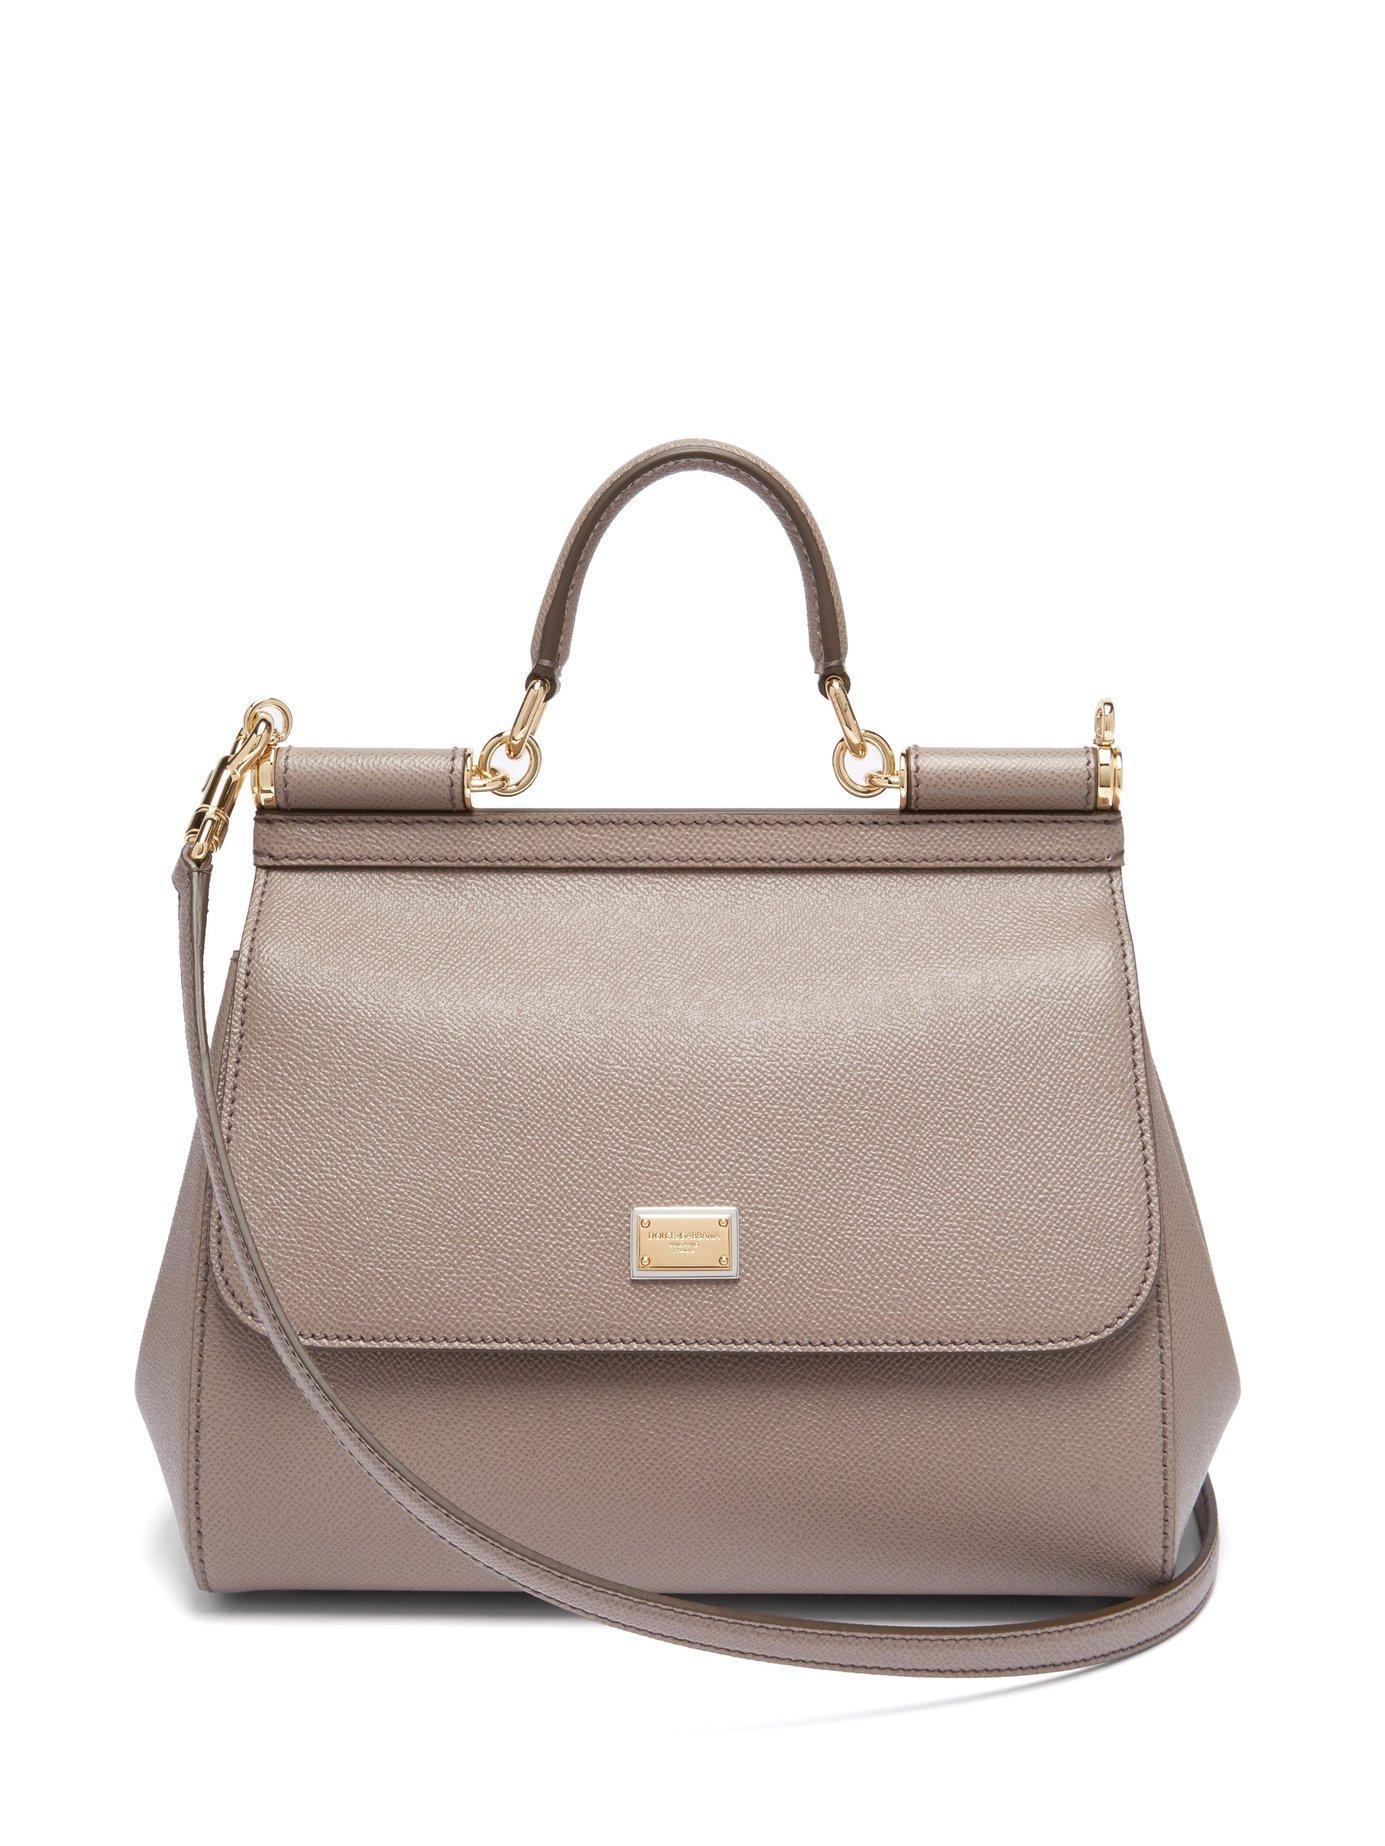 Lyst - Dolce   Gabbana Sicily Medium Dauphine Leather Bag in Gray 3bf7dcb72f